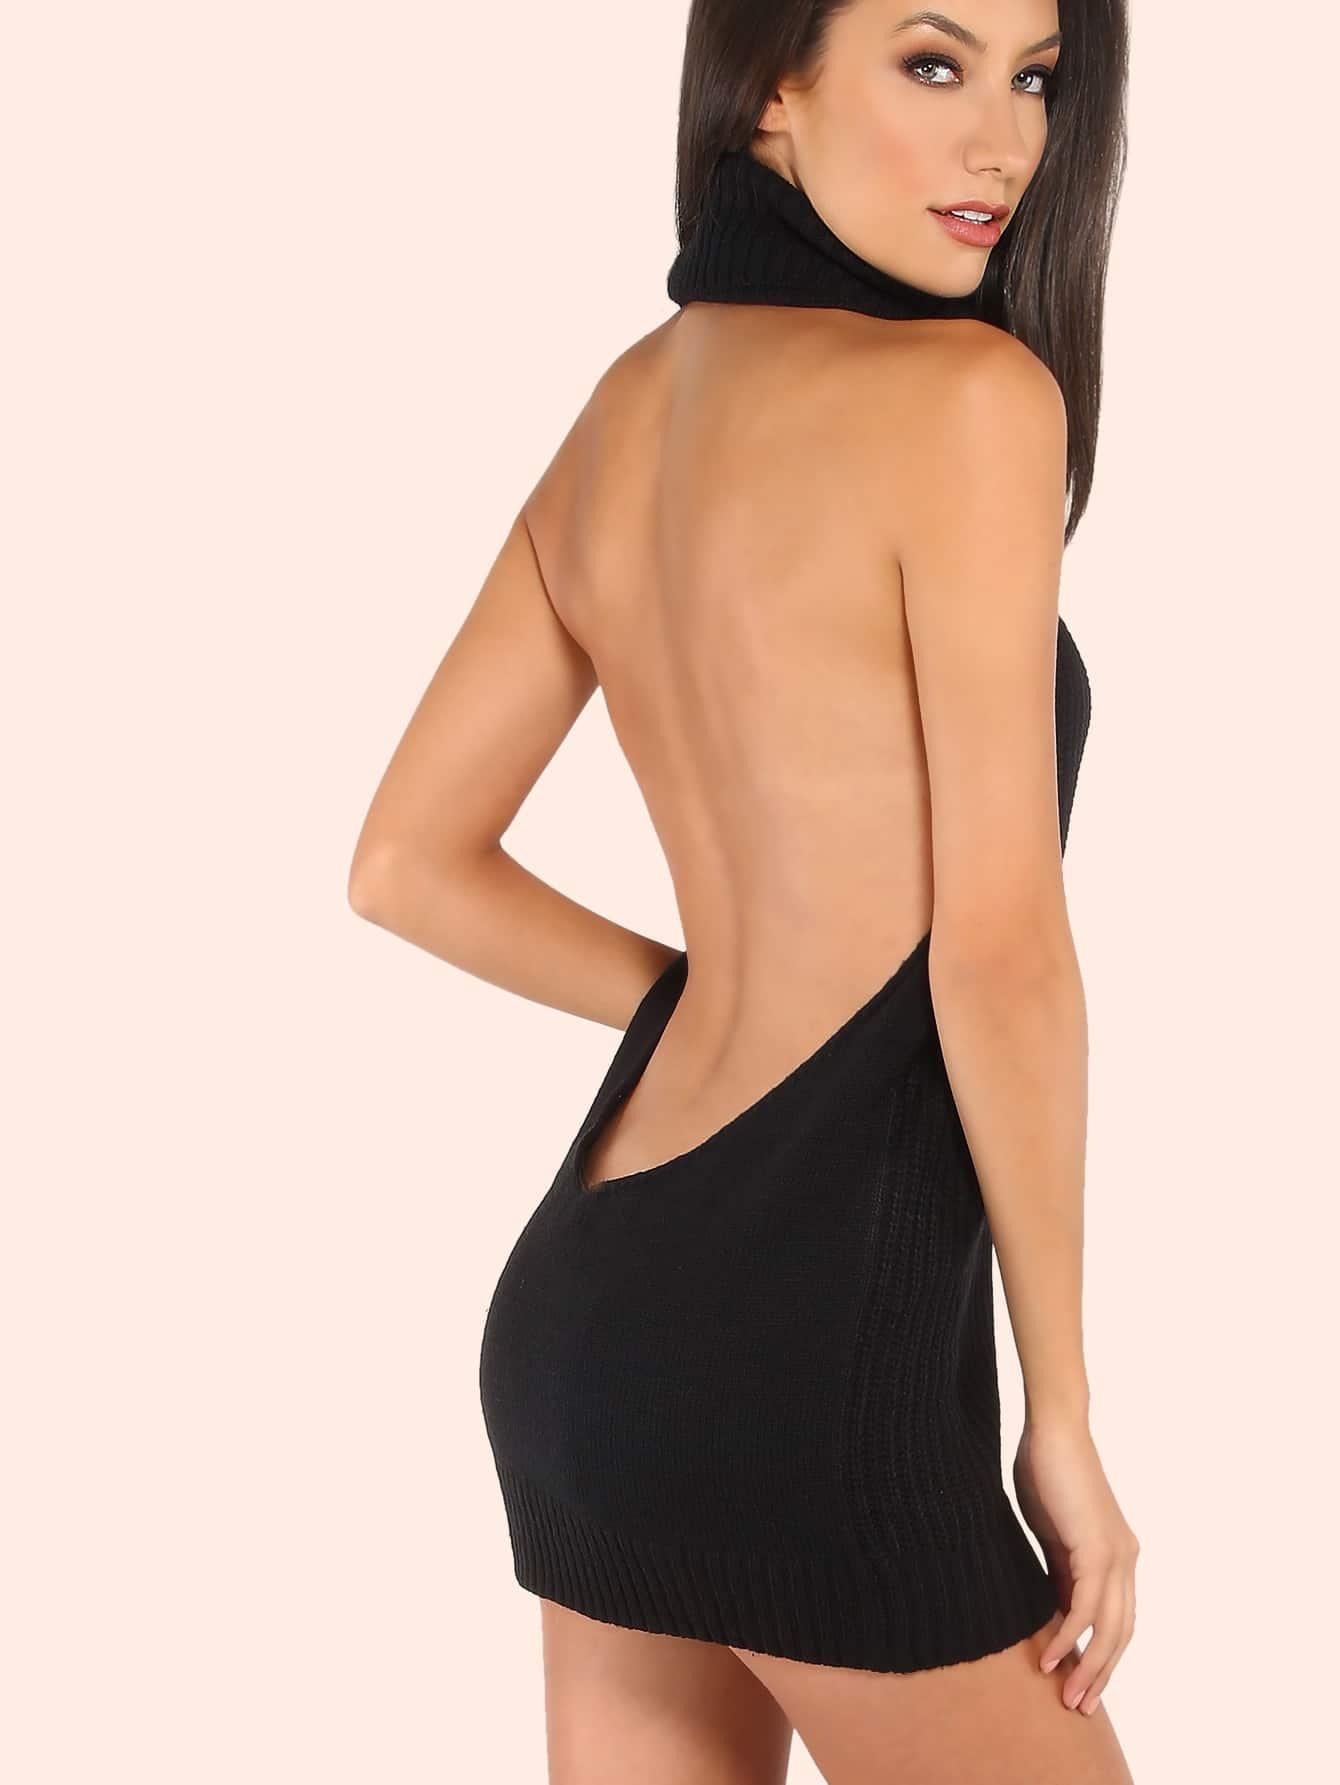 Backless Cowl Neck Mini Sweater Dress BLACK -SheIn(Sheinside)